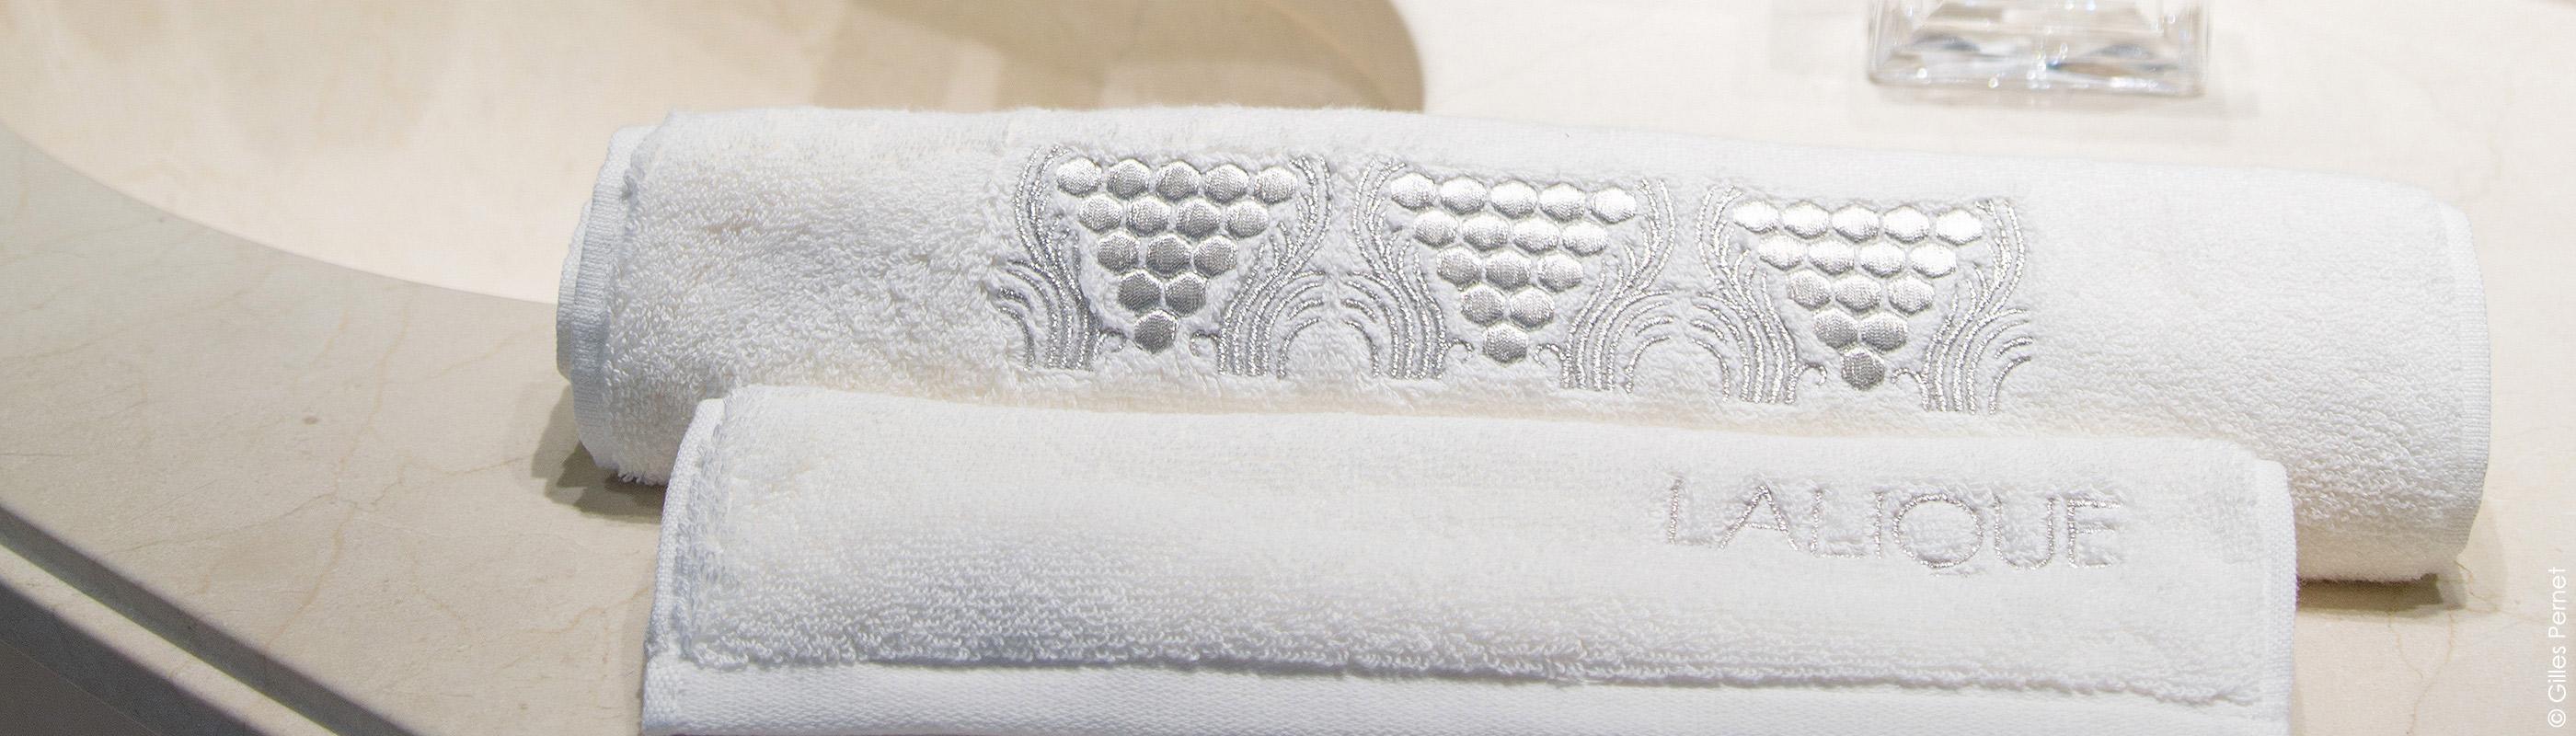 Bath Linens 7 Items